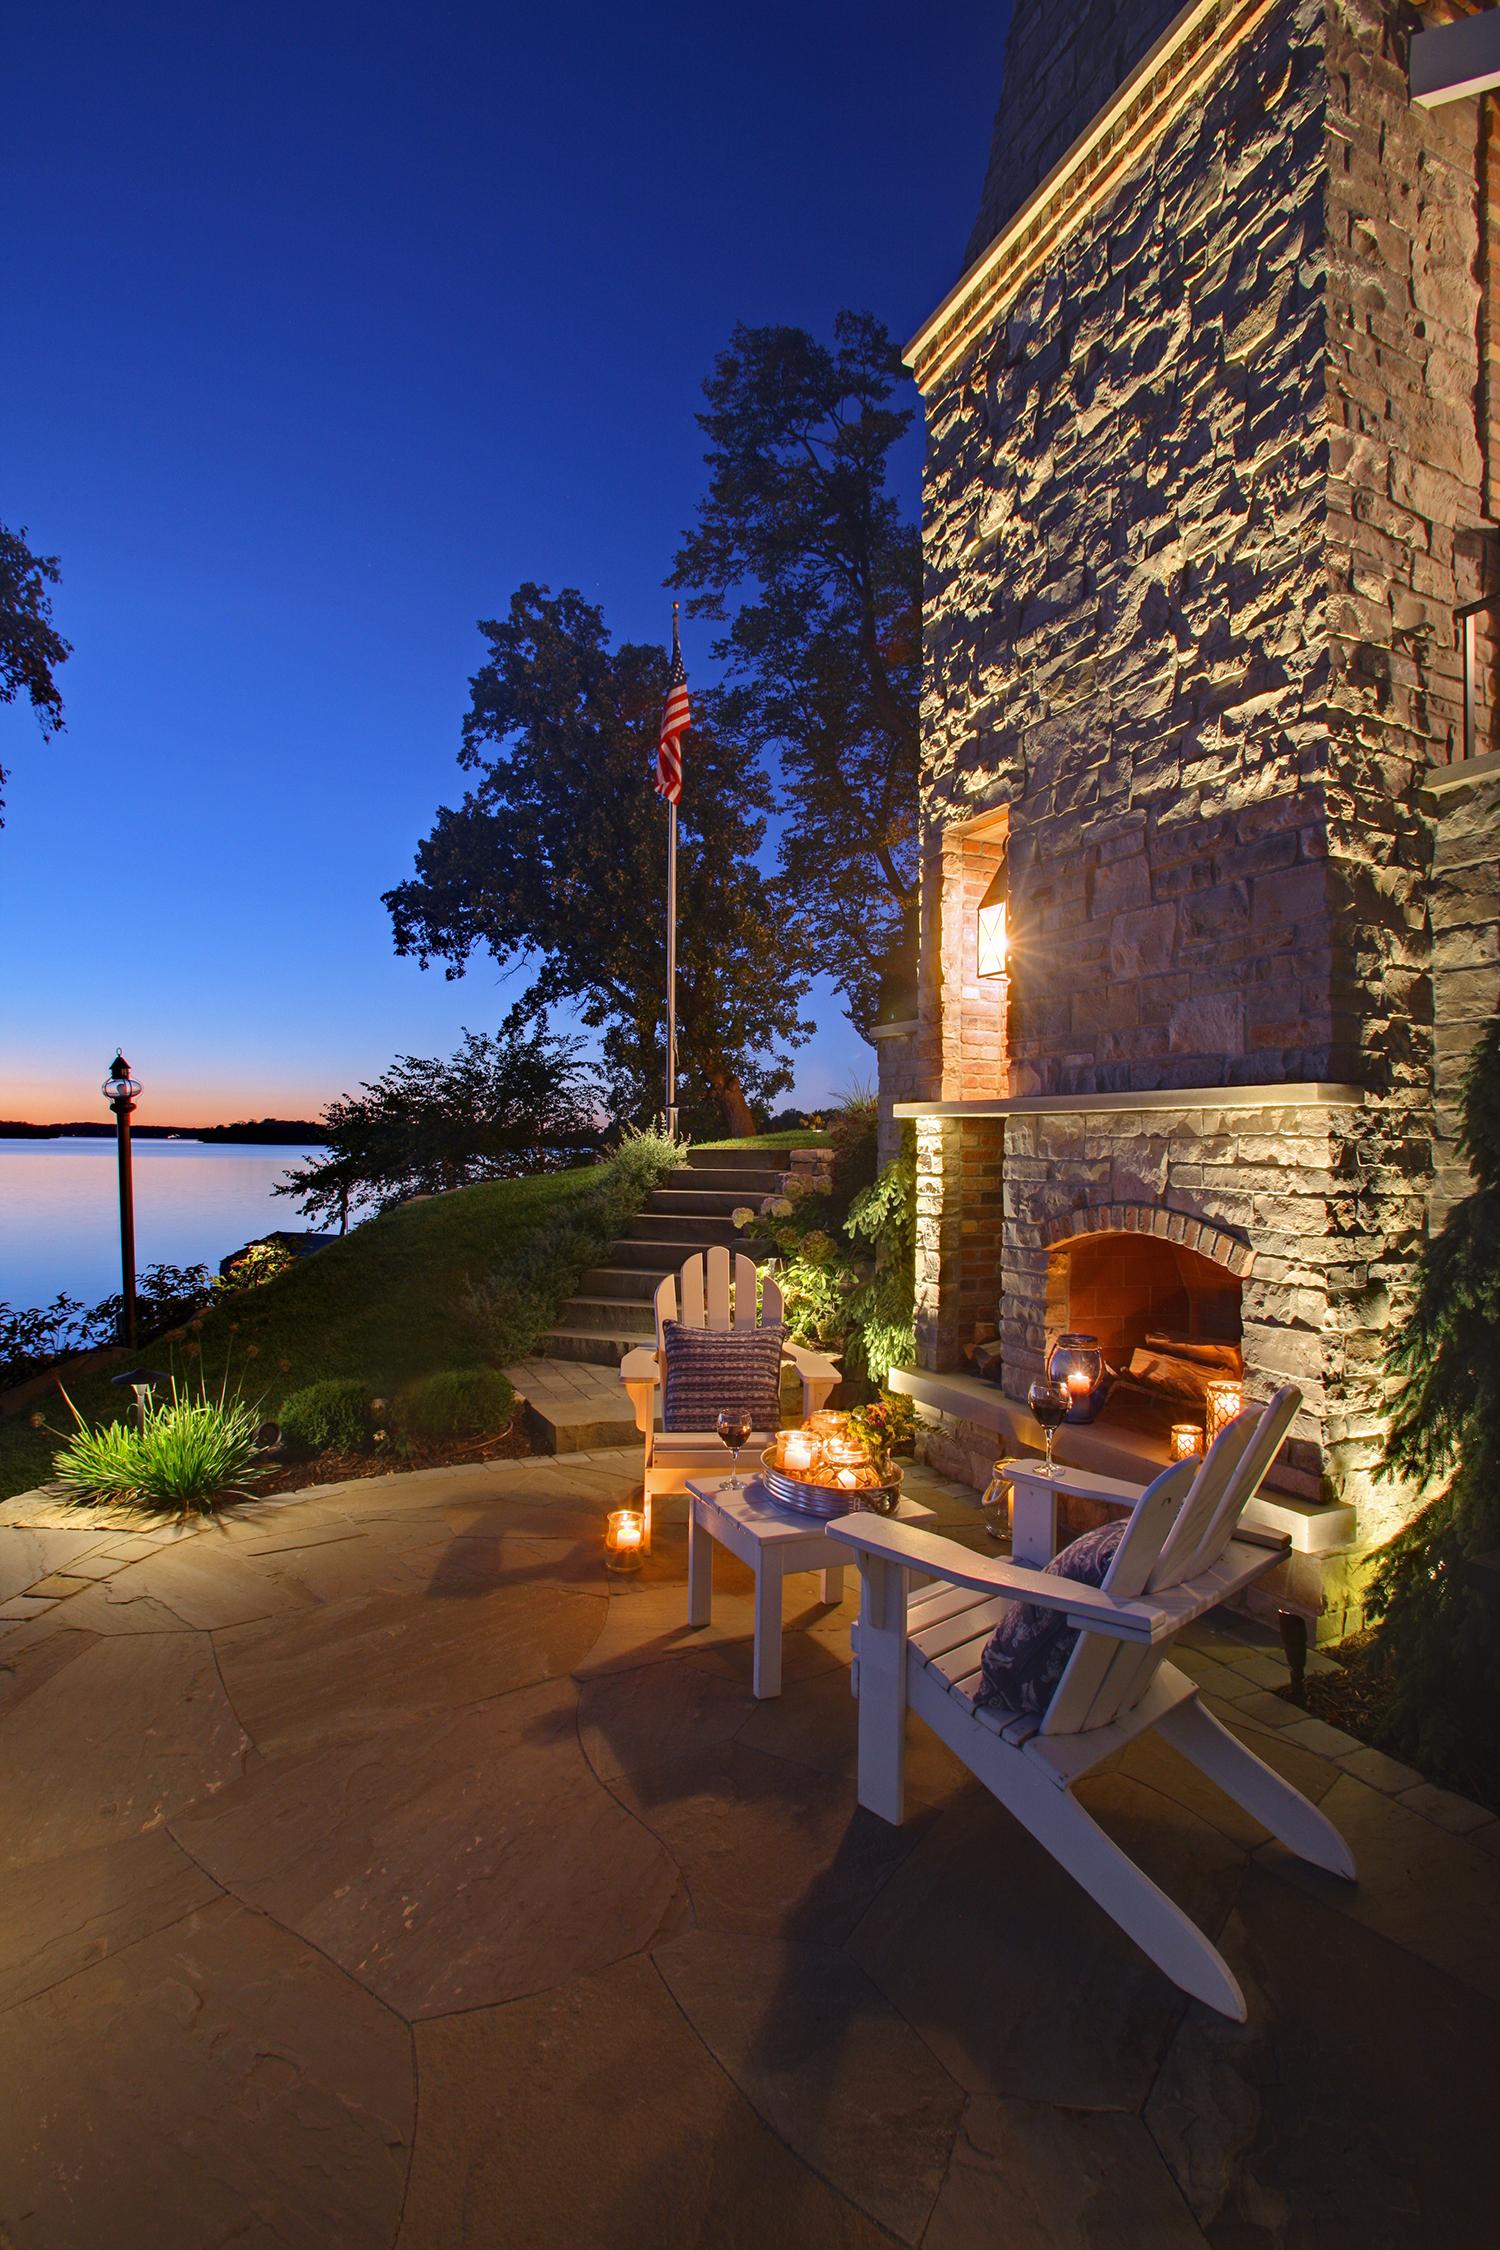 Mom's Design Build - Lake Minnetonka Fireplace stone yard design